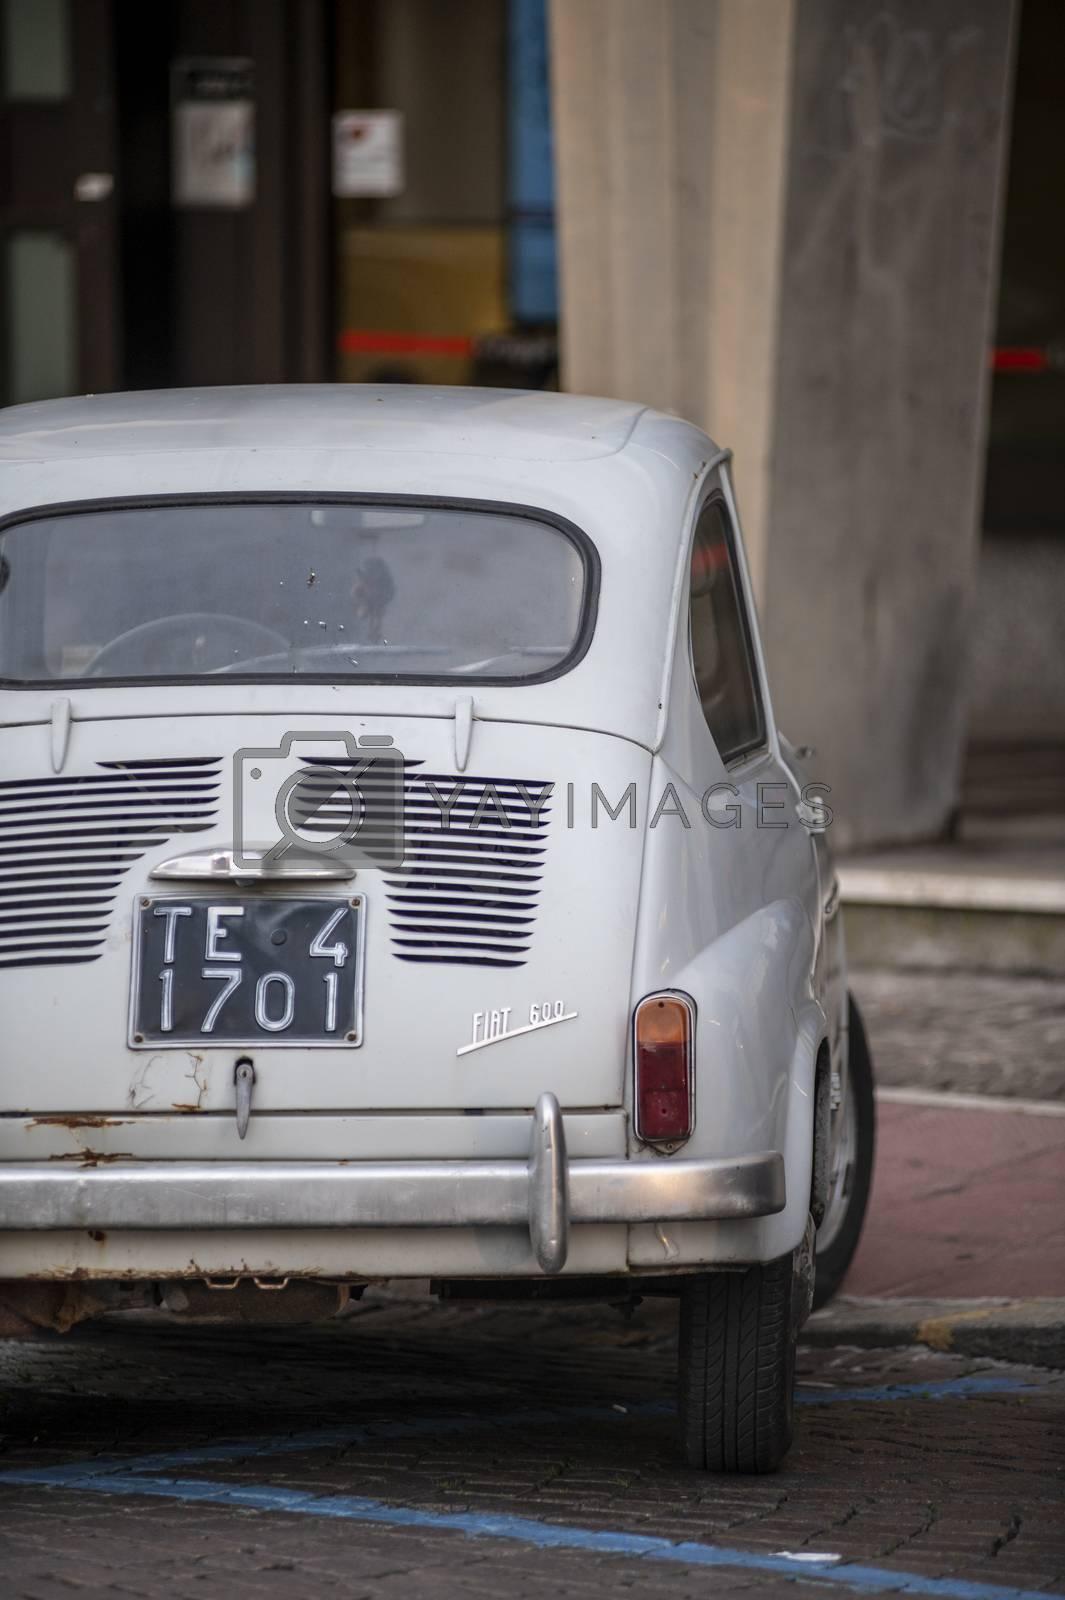 terni,italy november 17 2020:detail of the vintage fiat 600